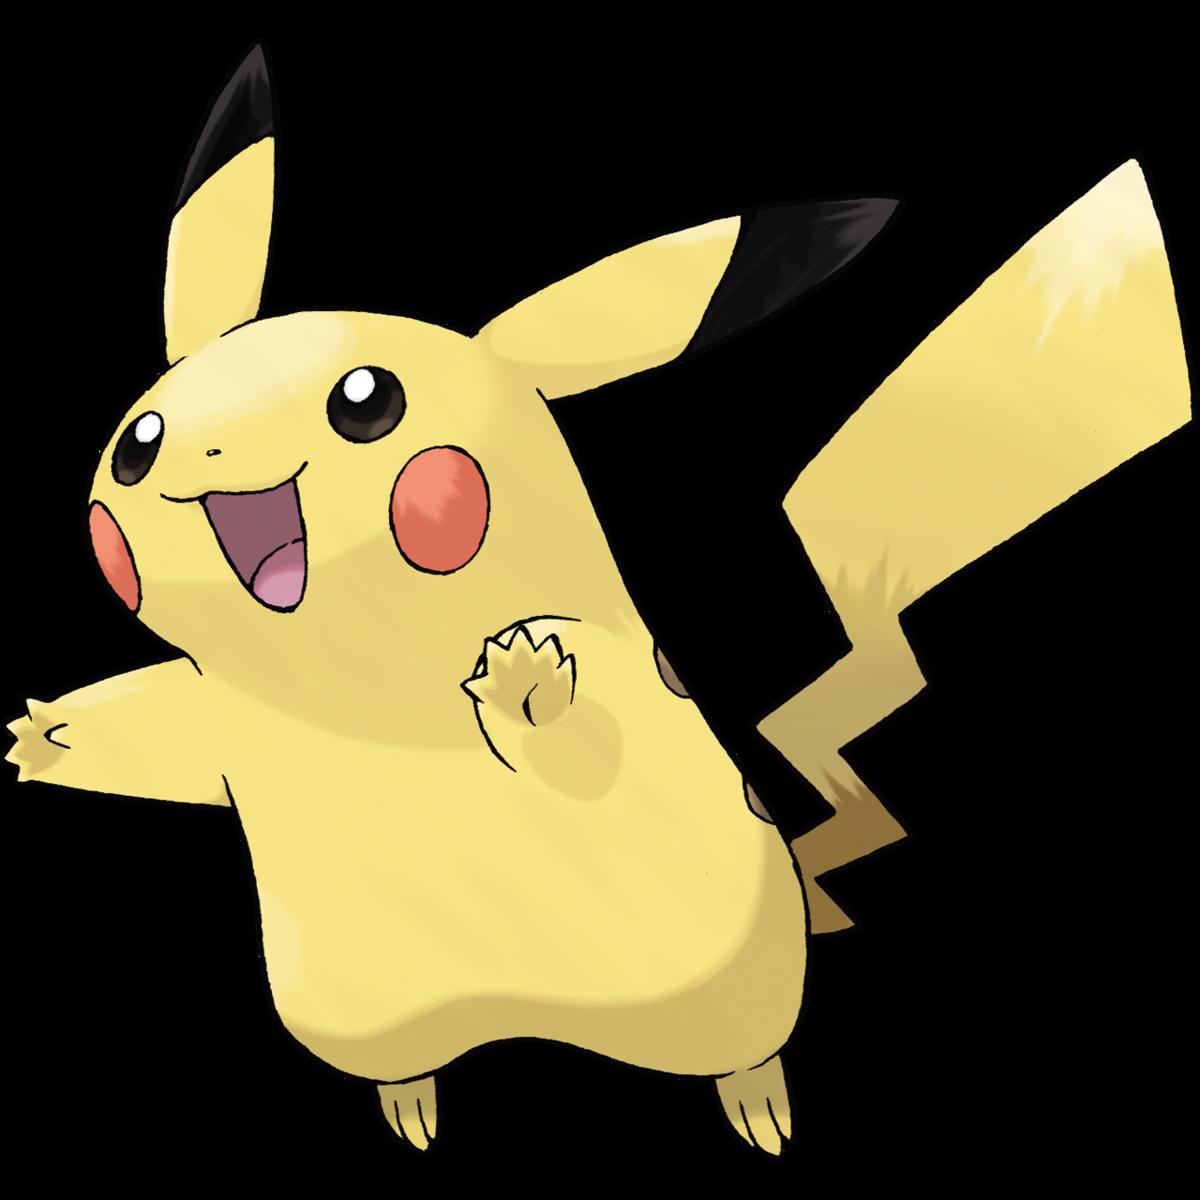 Pikachu Sugimori Artwork